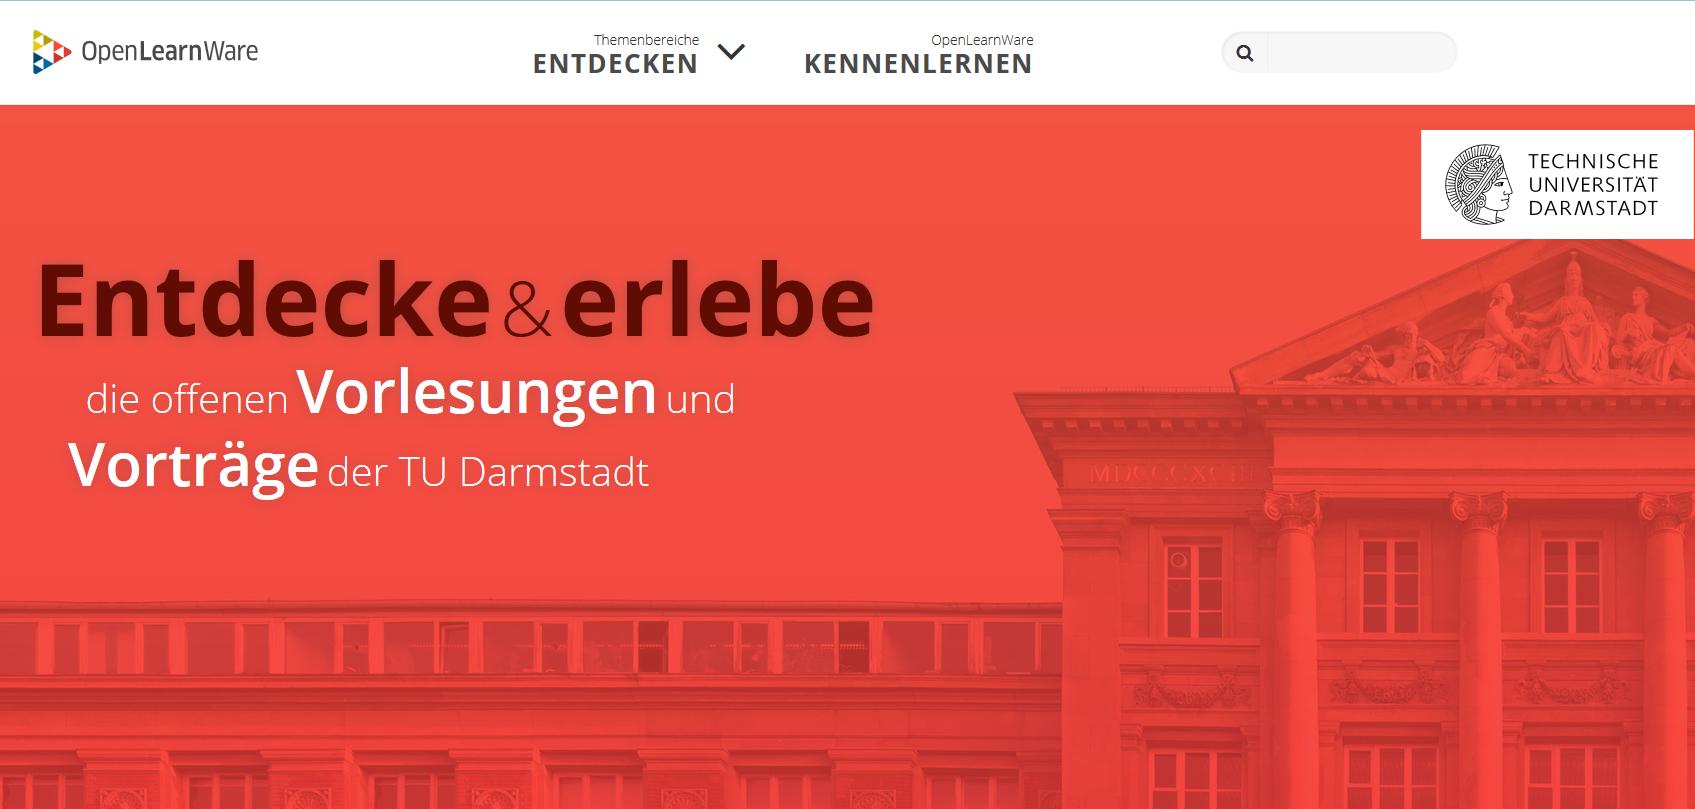 Screenshot OpenLearnware der TU Darmstadt